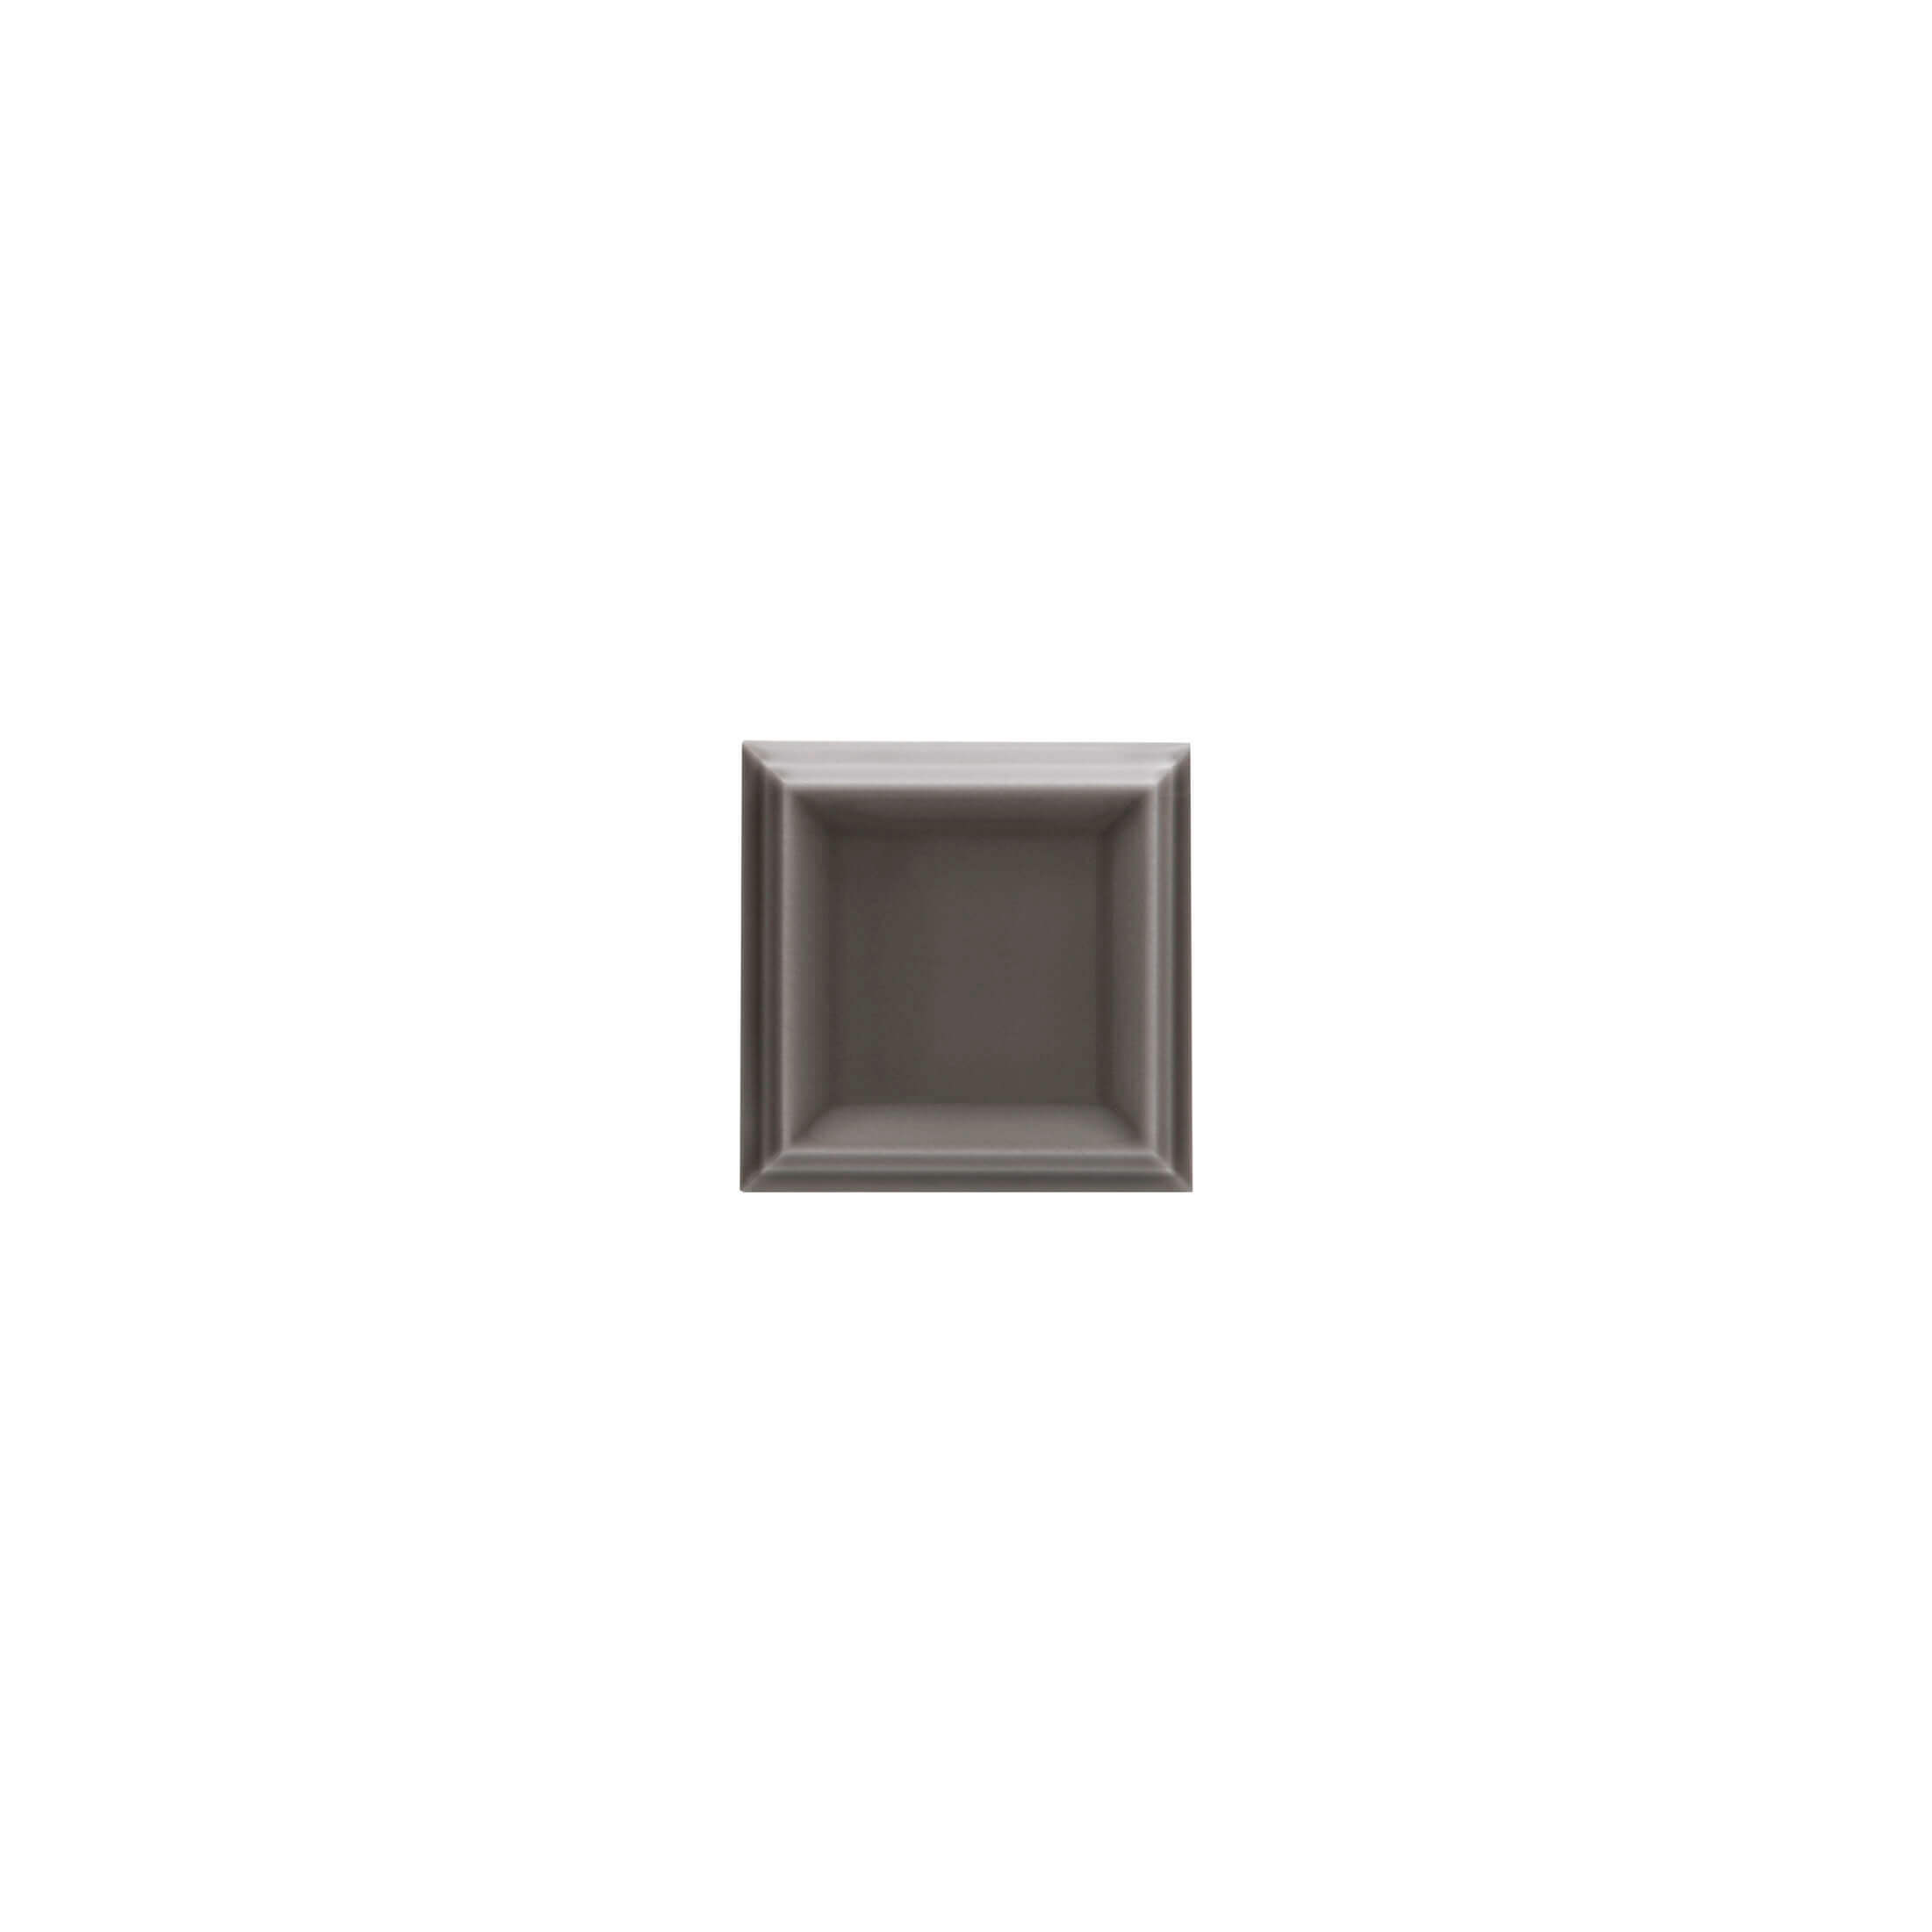 ADEX-ADST1081-LISO-FRAMED   -7.3 cm-7.3 cm-STUDIO>TIMBERLINE